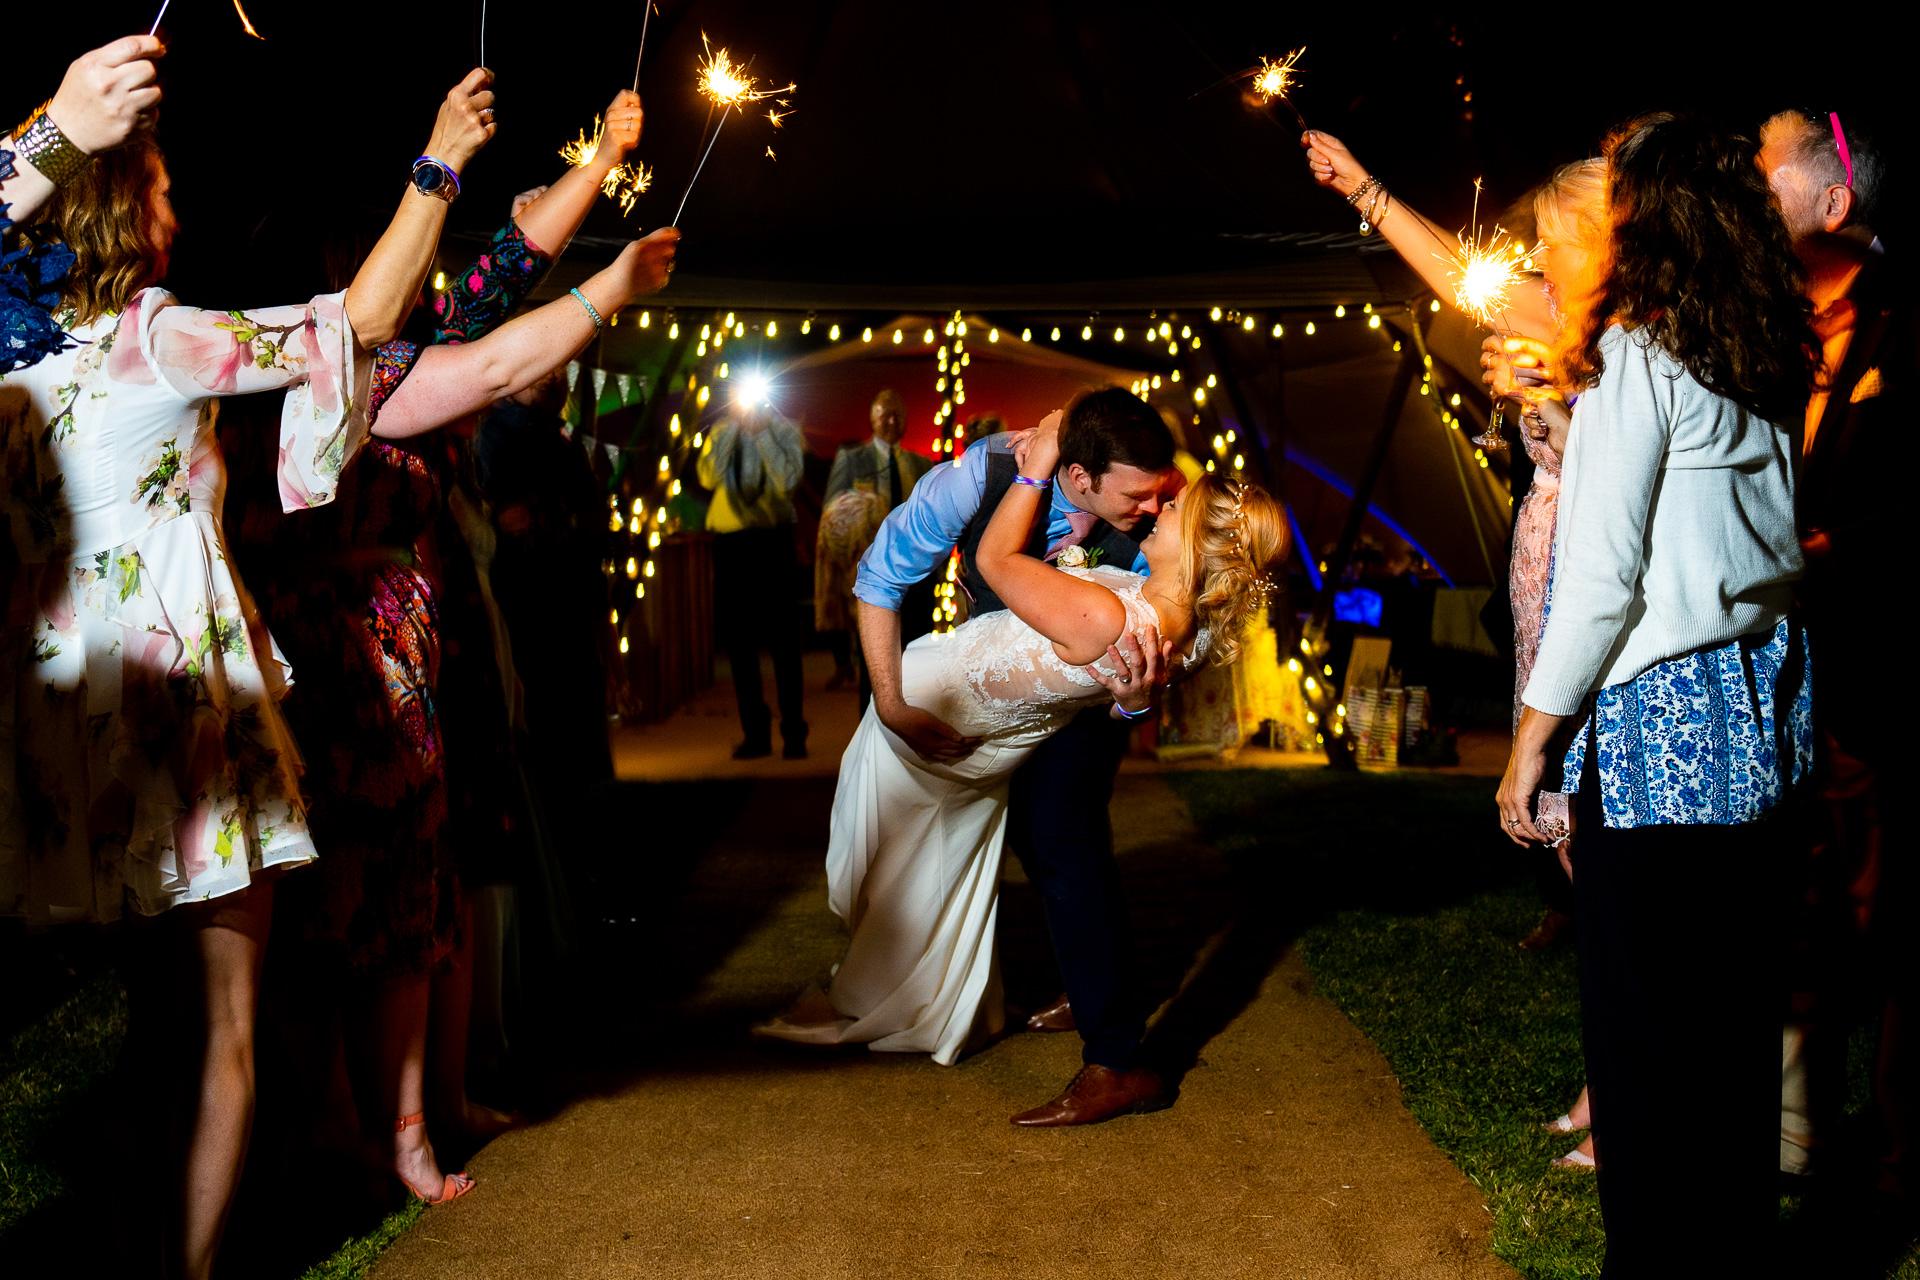 Lattenbury-Hill-Weddings-Websized-Andy-Mitty-26.jpg